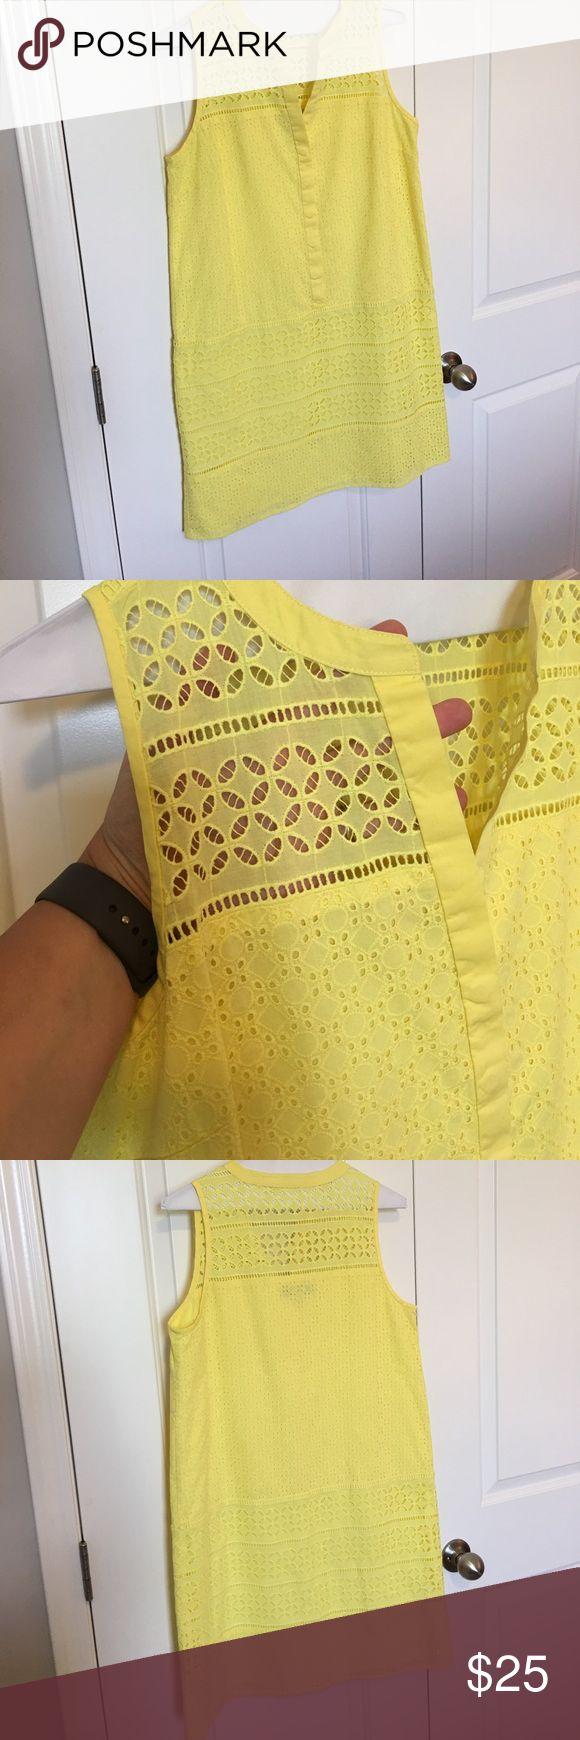 LOFT yellow eyelet shift sundress sz 8 LOFT yellow eyelet shift sundress. See through eyelet in front and back at shoulders. Lined. Hidden button front. Sz 8 LOFT Dresses